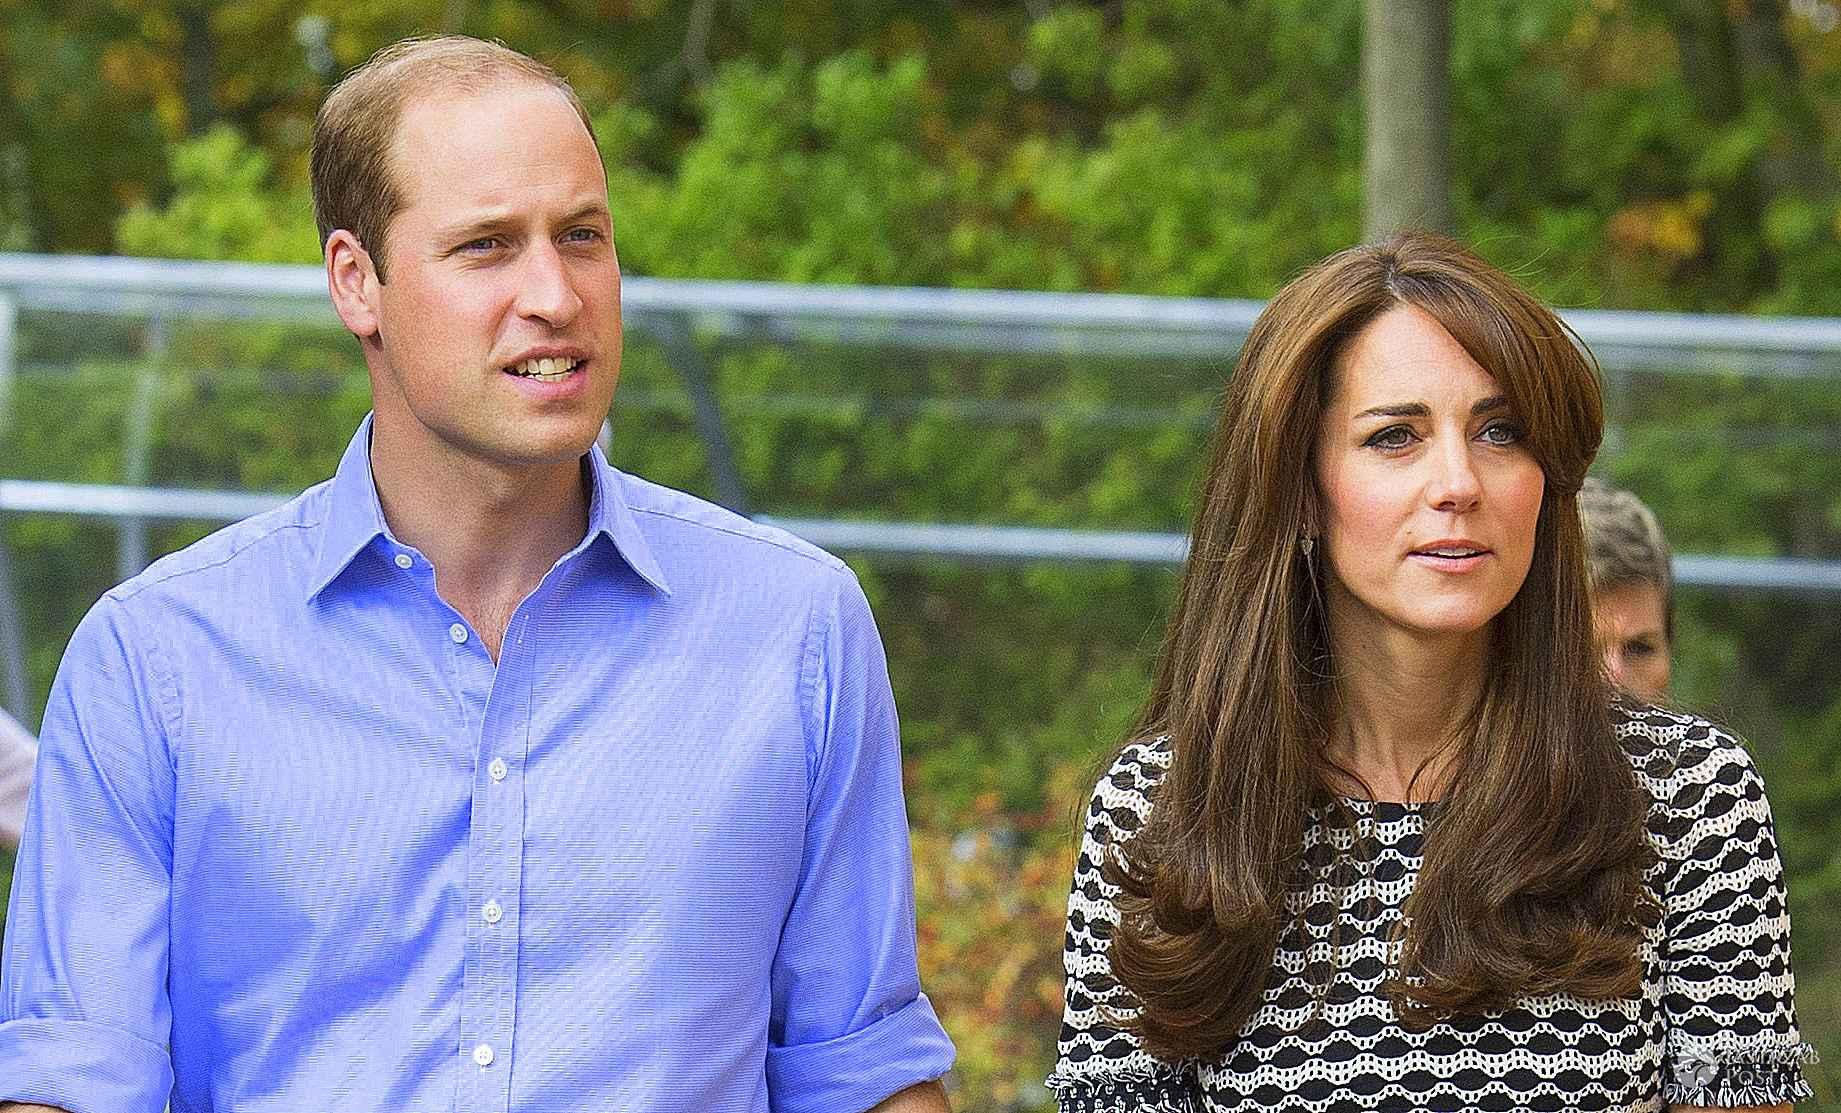 Samobójca pod domem Księcia Williama i Księcia Kate